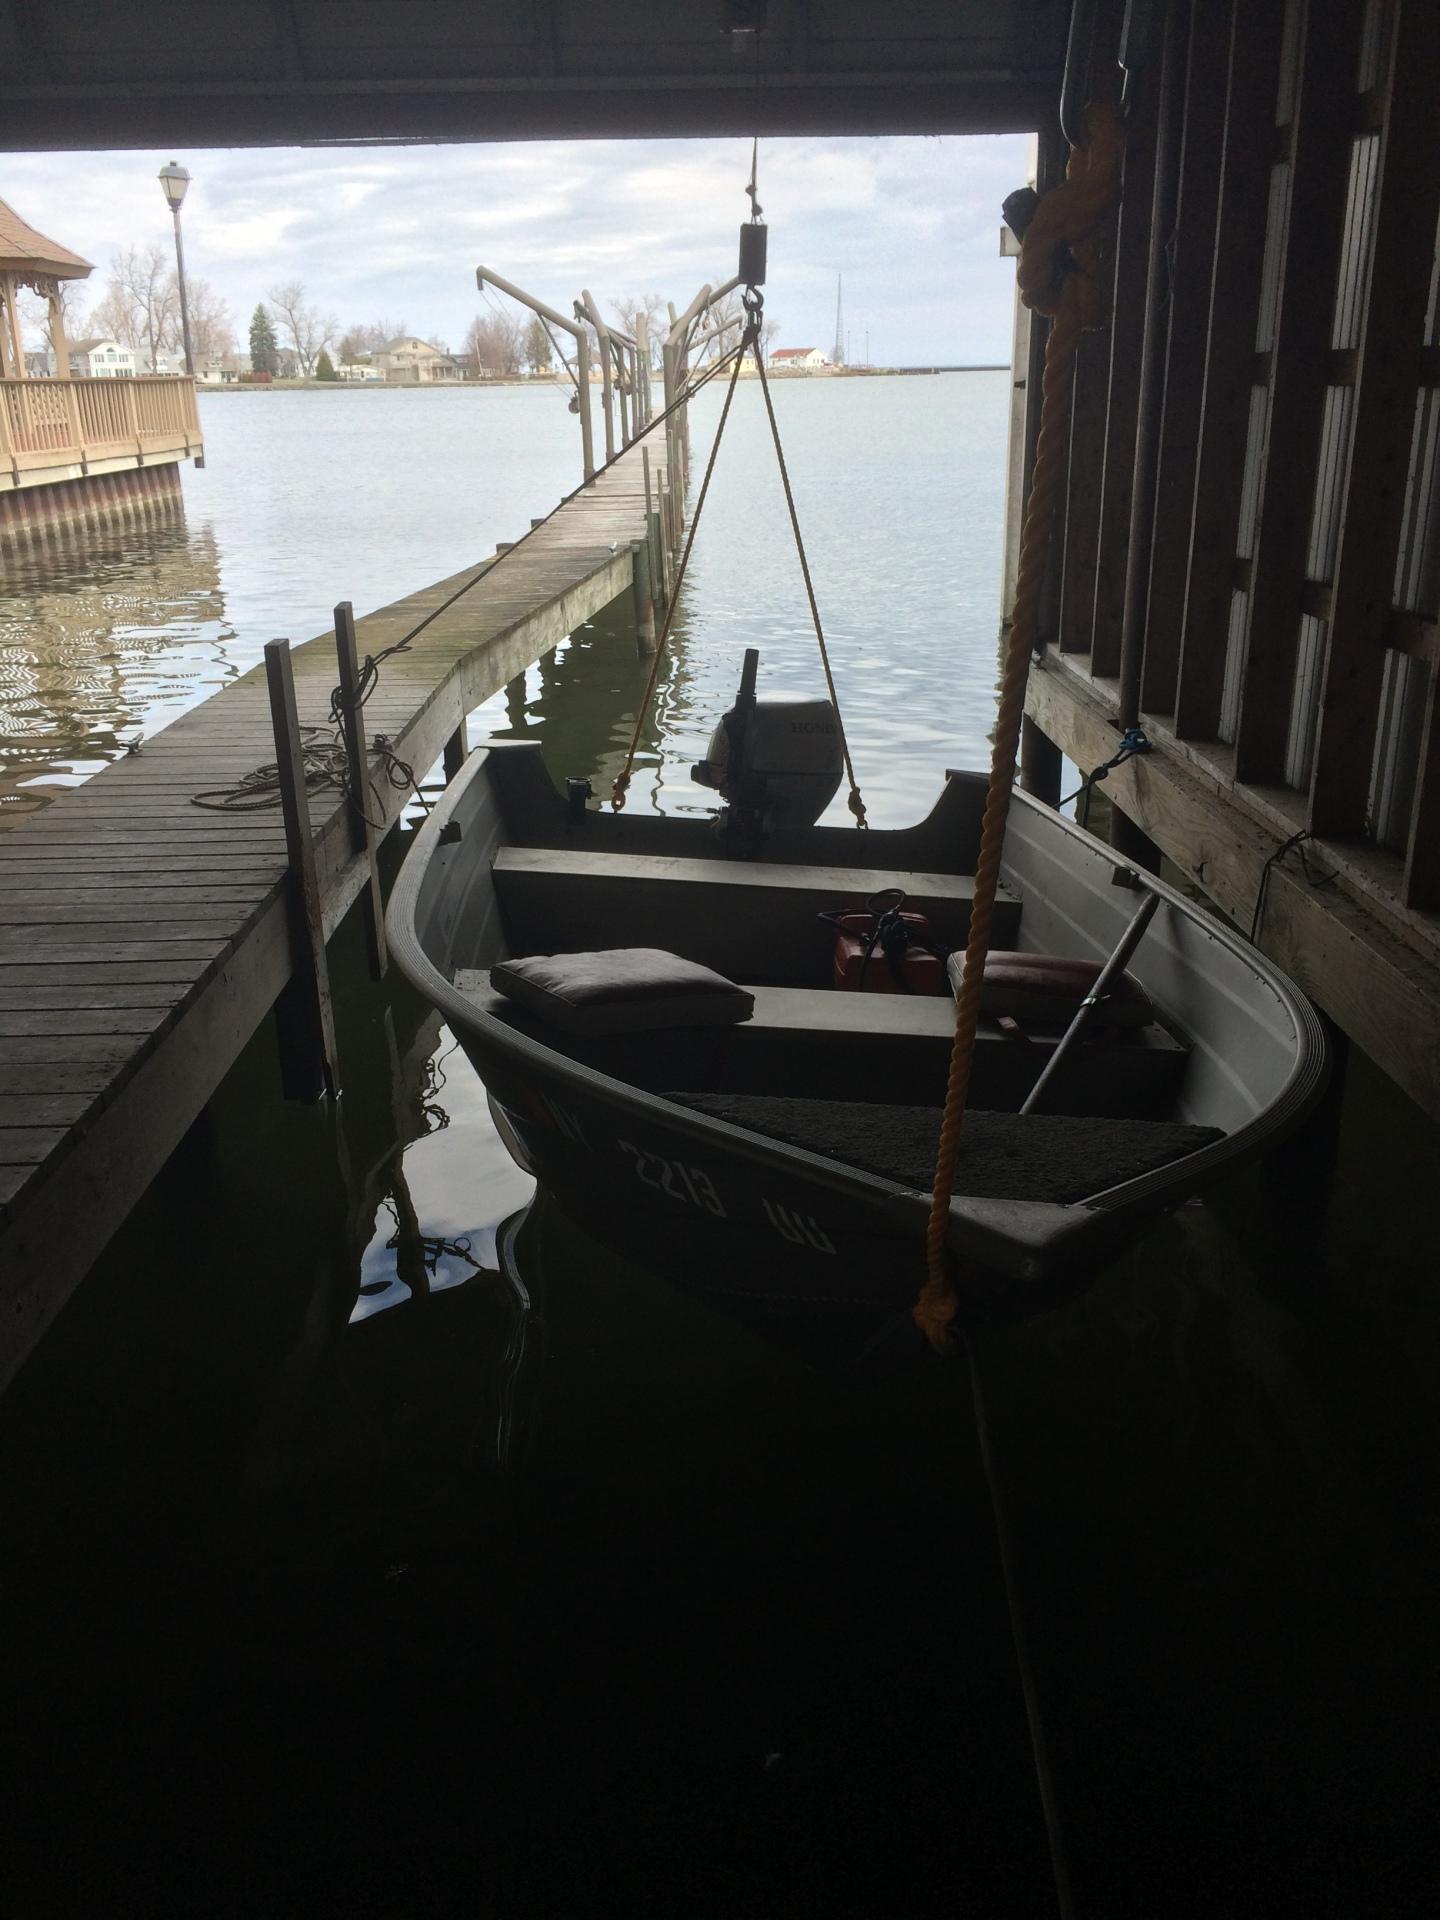 Inside Boat House